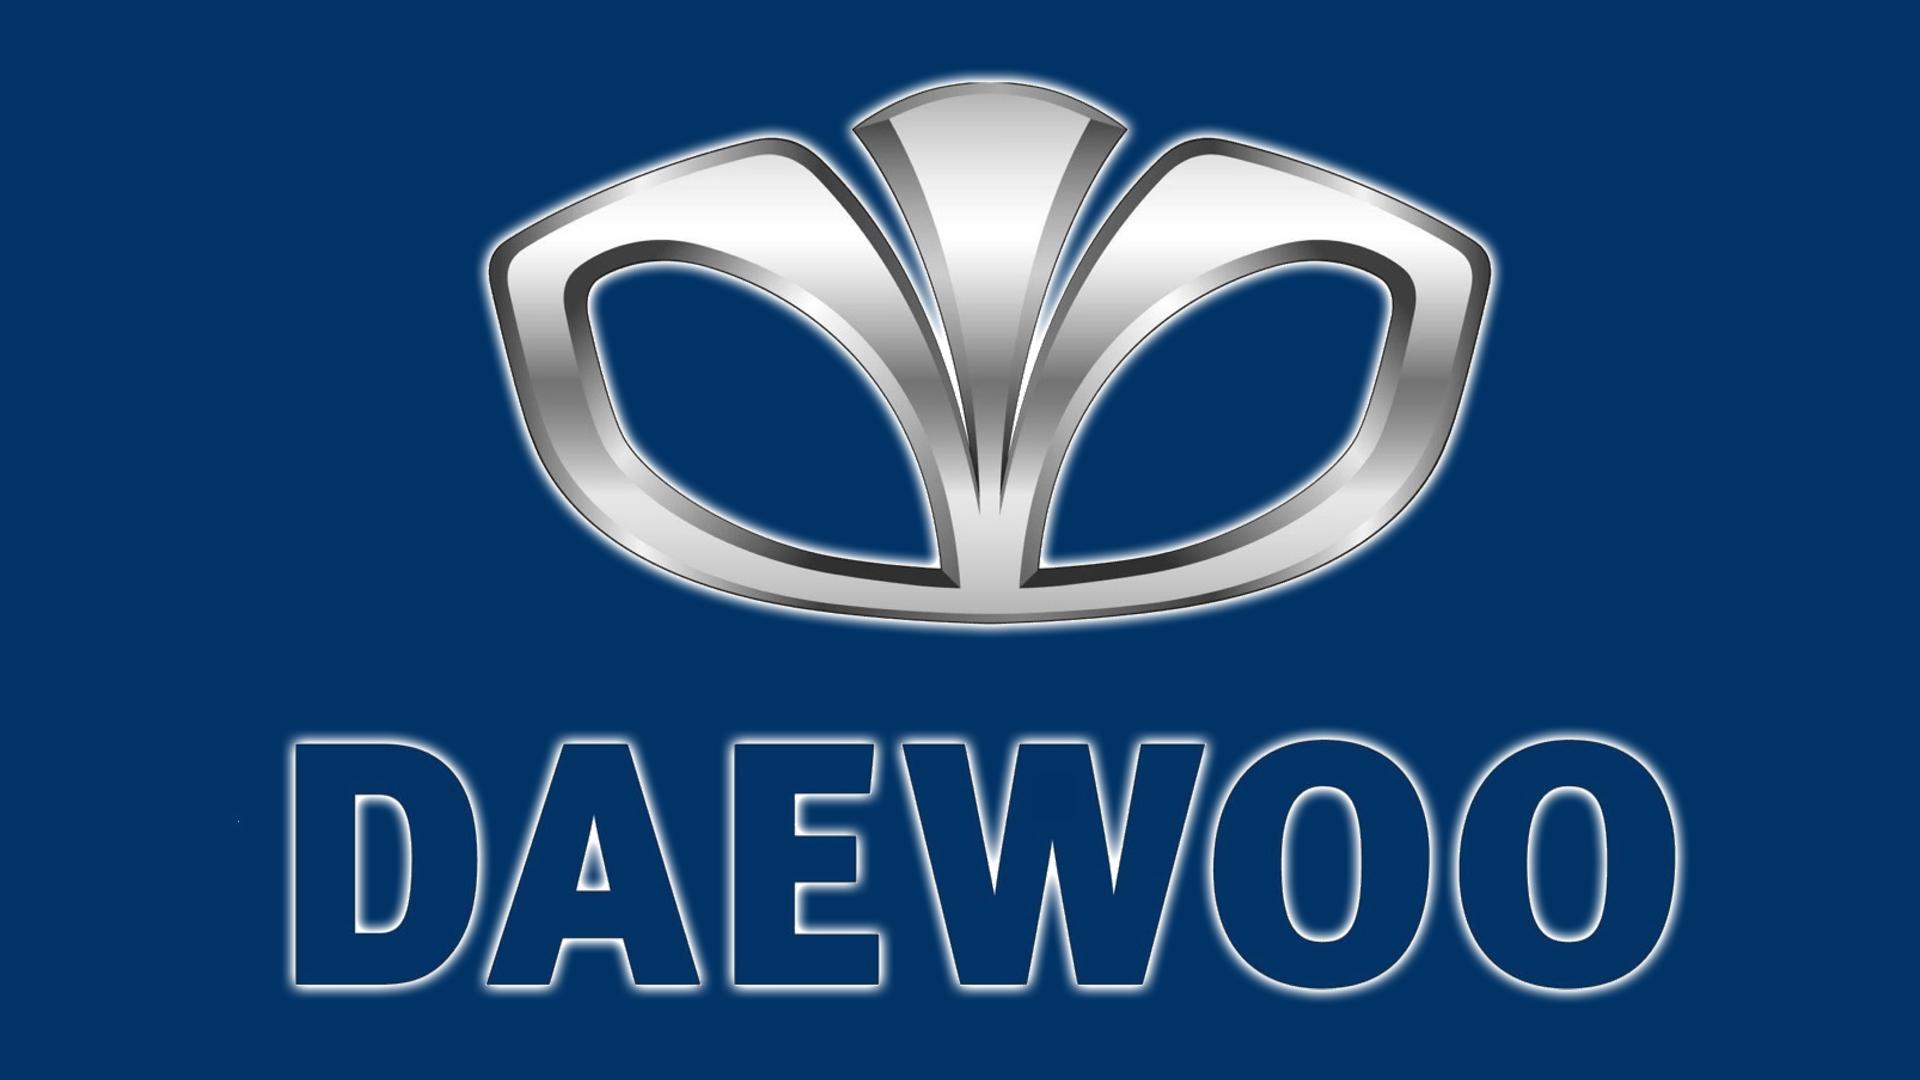 British Car Brands >> Daewoo Logo Meaning and History [Daewoo symbol]